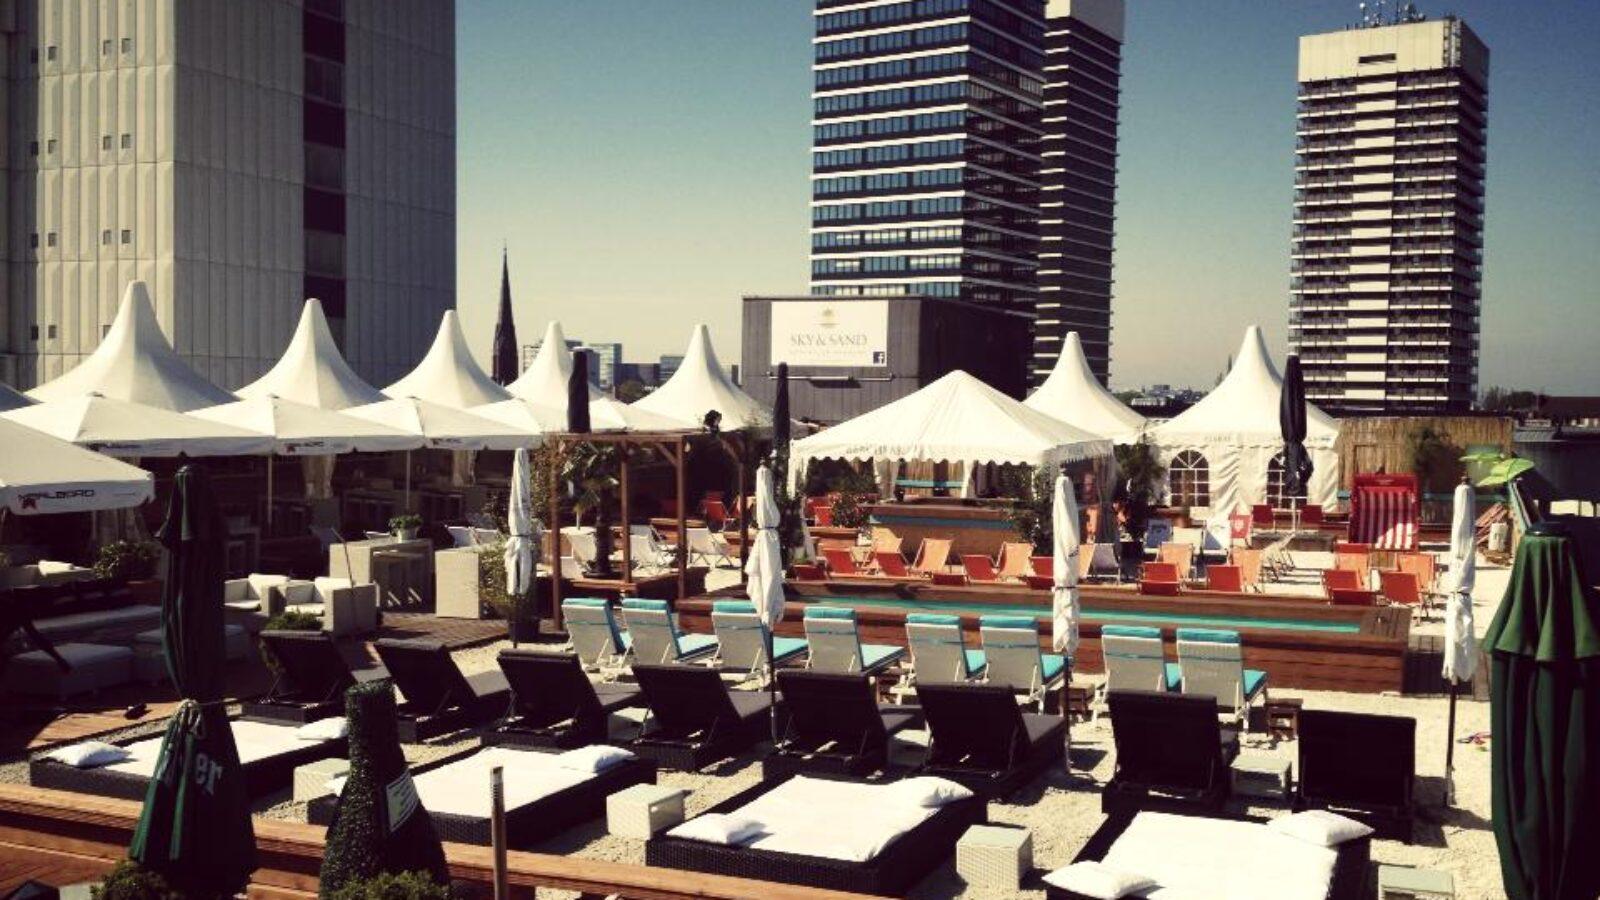 OXMOX Außengastro-Tipp: Restaurant Sky & Sand Beachclub